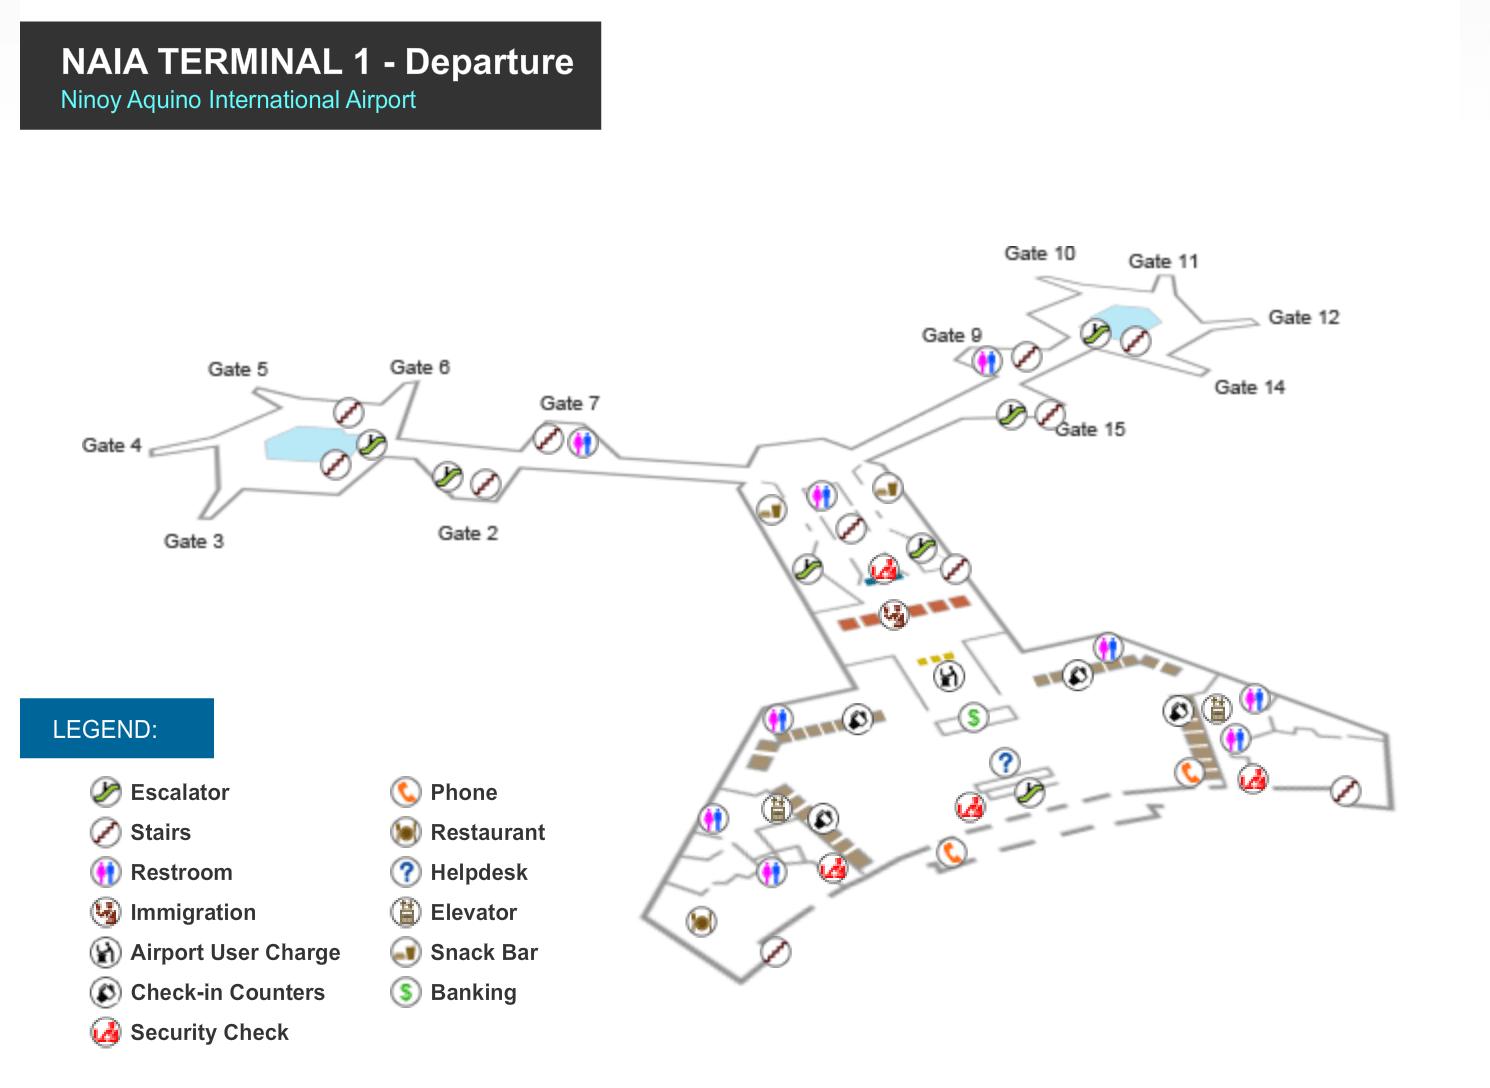 Manila Flughafen Terminal 1 Karte NAIA 1 - Abflugbereich